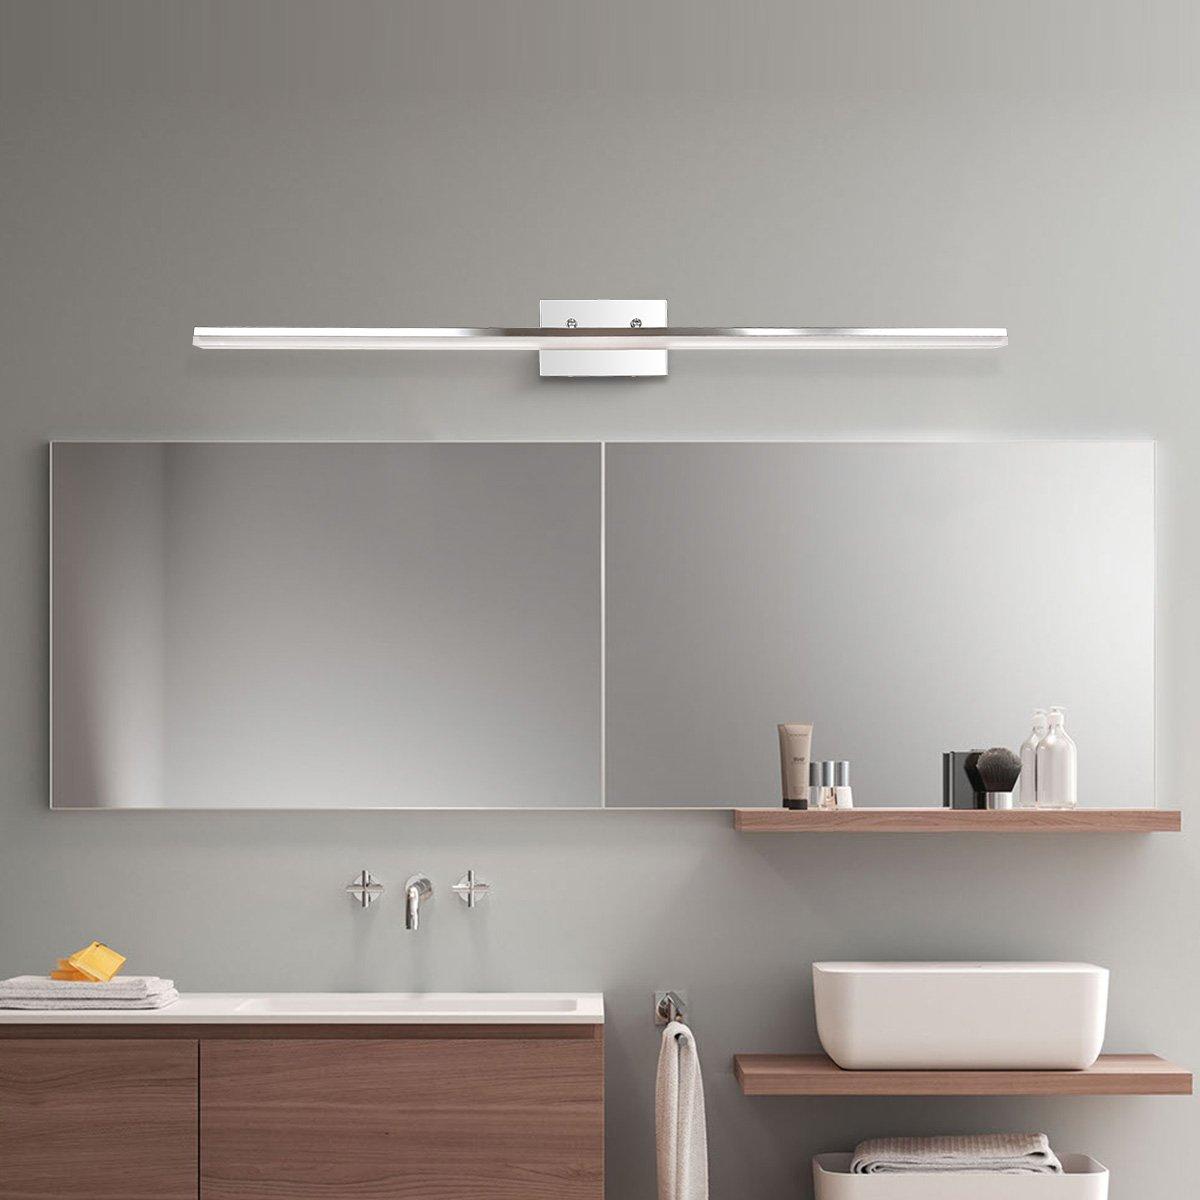 mirrea 48in modern LED vanity light for bathroom lighting dimmable 46w warm white